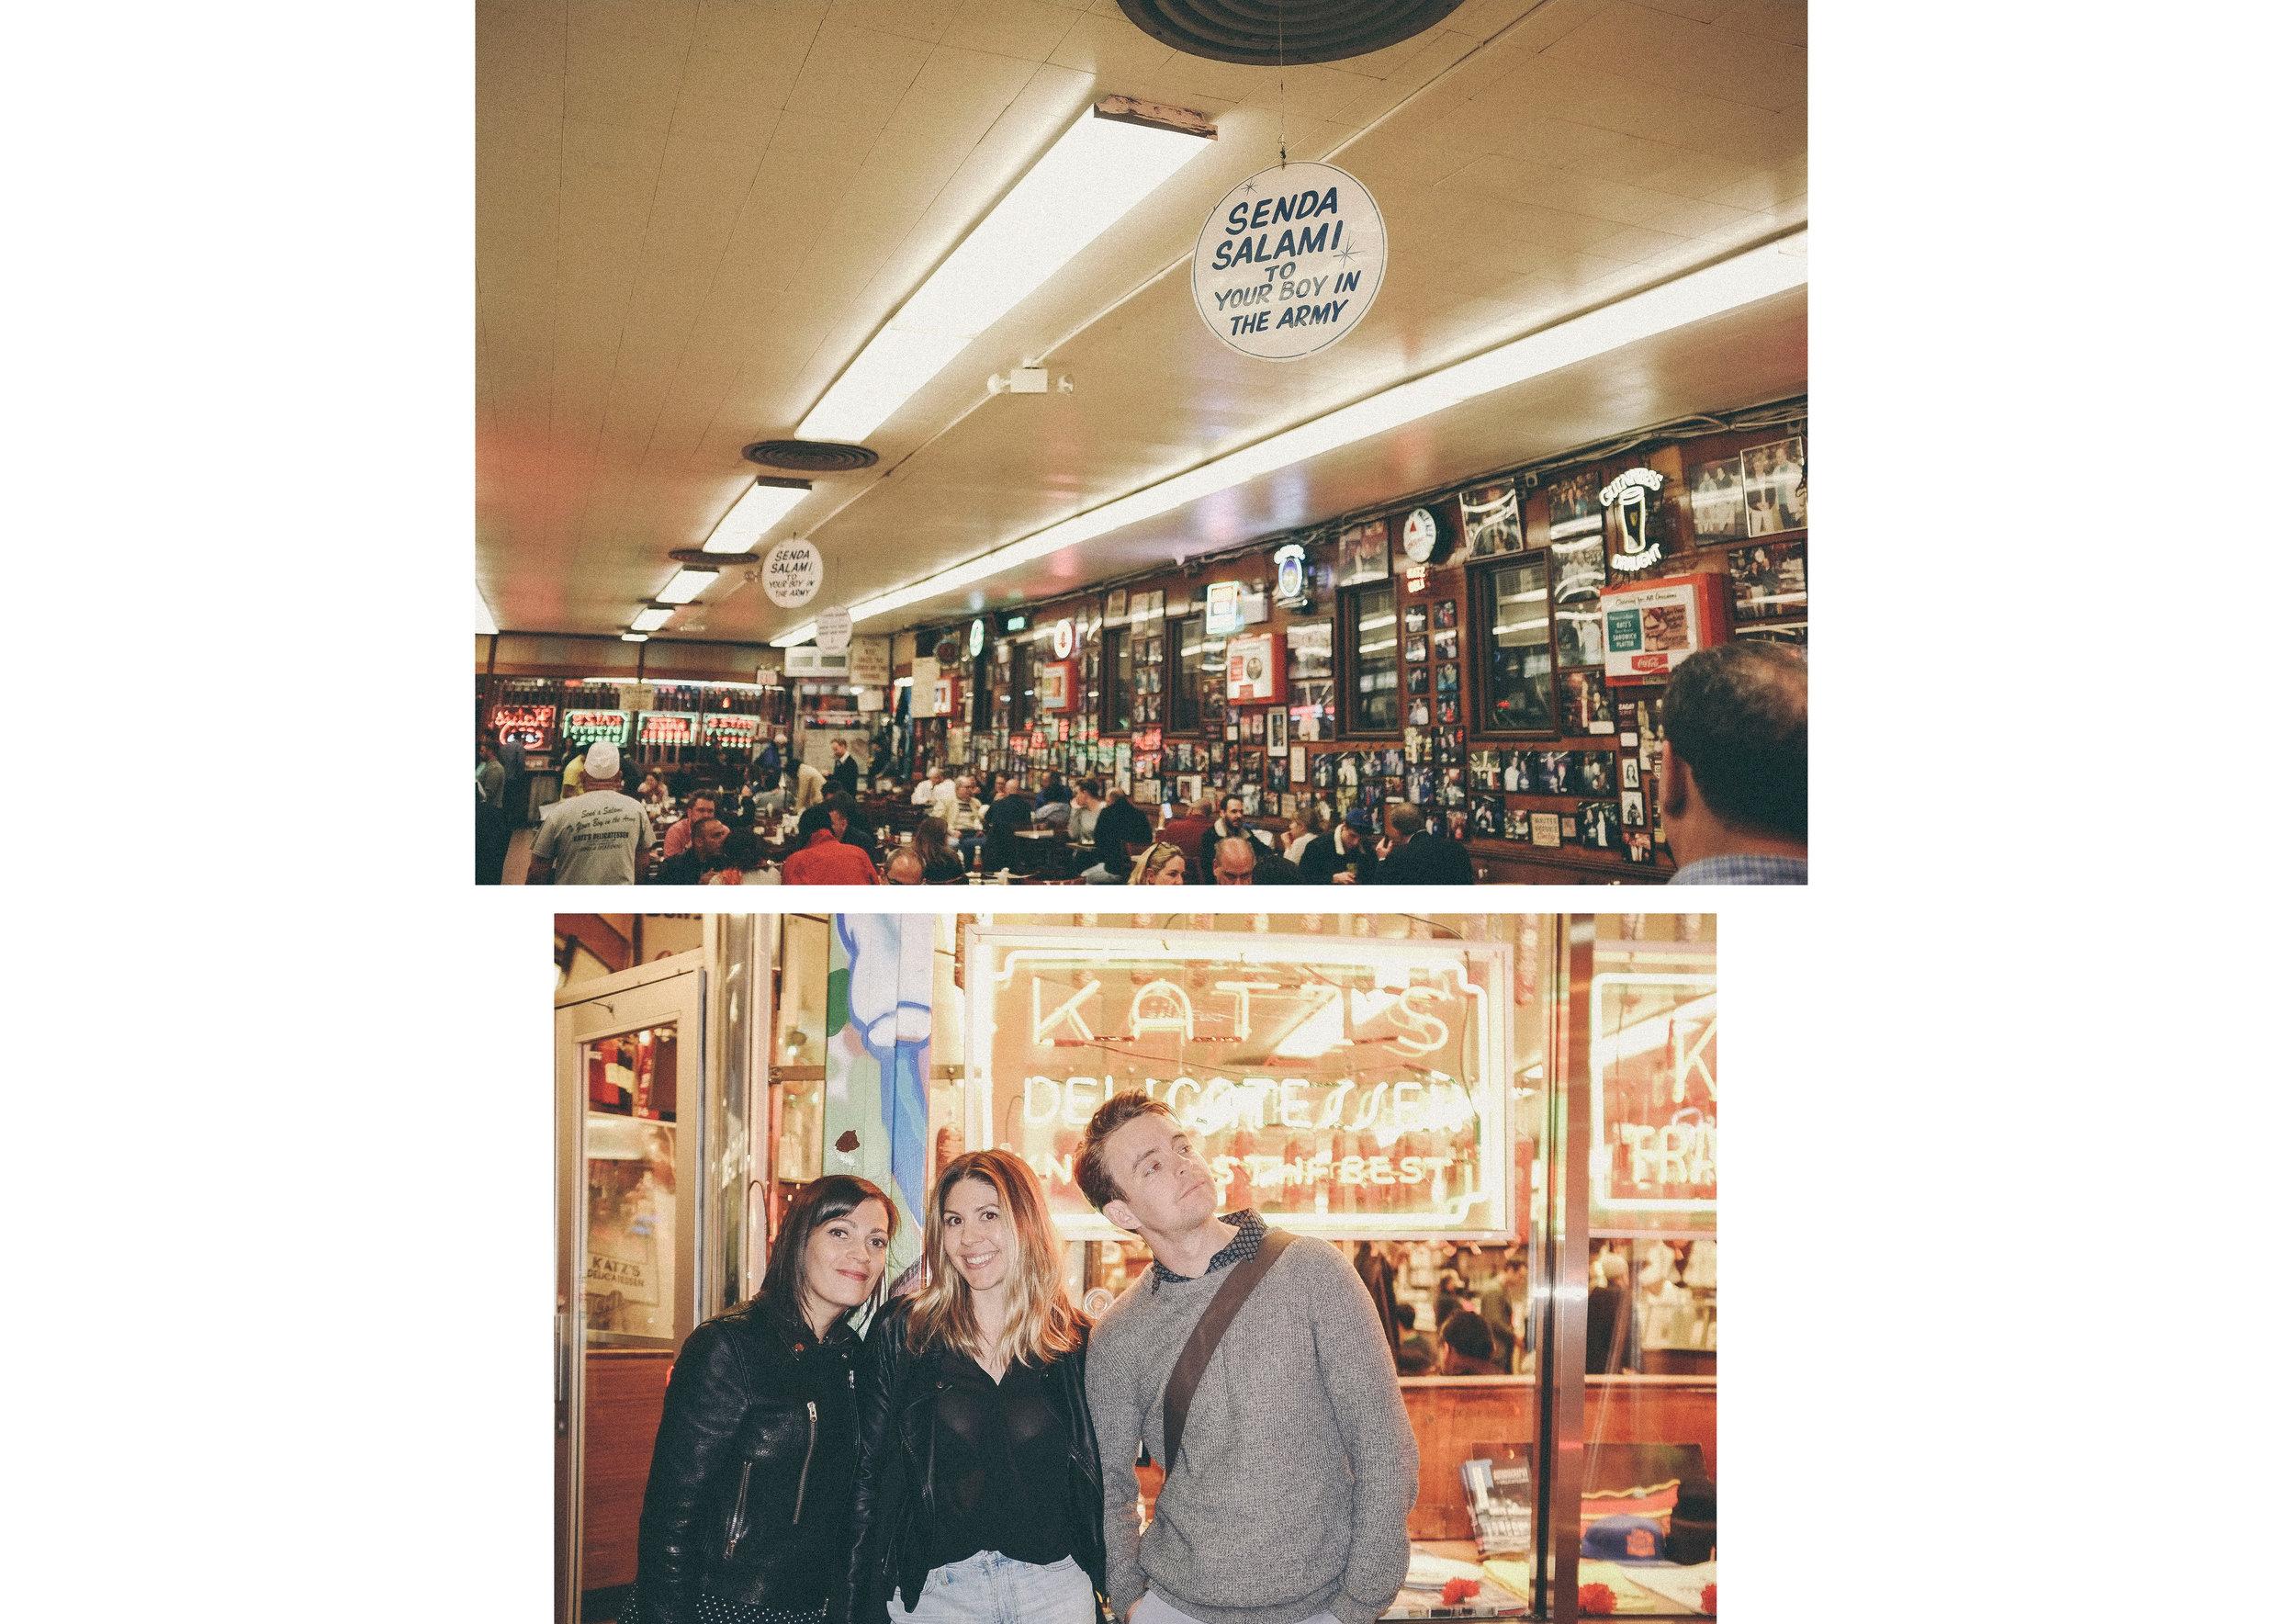 dérrive travel - KATZ'S DELI, new york #katzsdeli #soho #dumbo #newyork #nyc #brooklyn